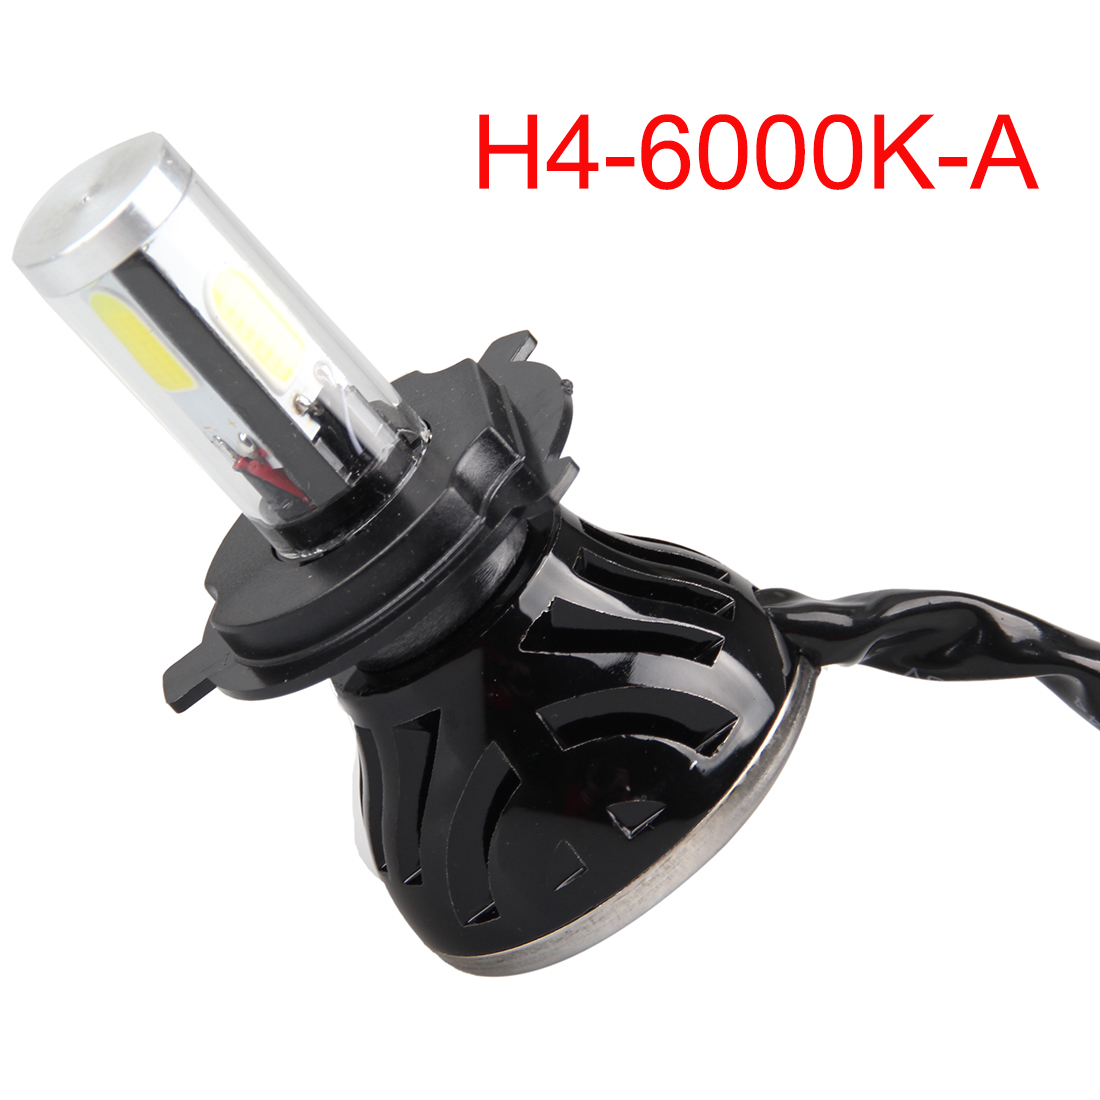 HOT Auto Care H4 Car Led Headlight High Power Diamond Auto H4-3 Hi/lo High Low 40W X2 White 6000K Repalcement Bi xenon Headlamp